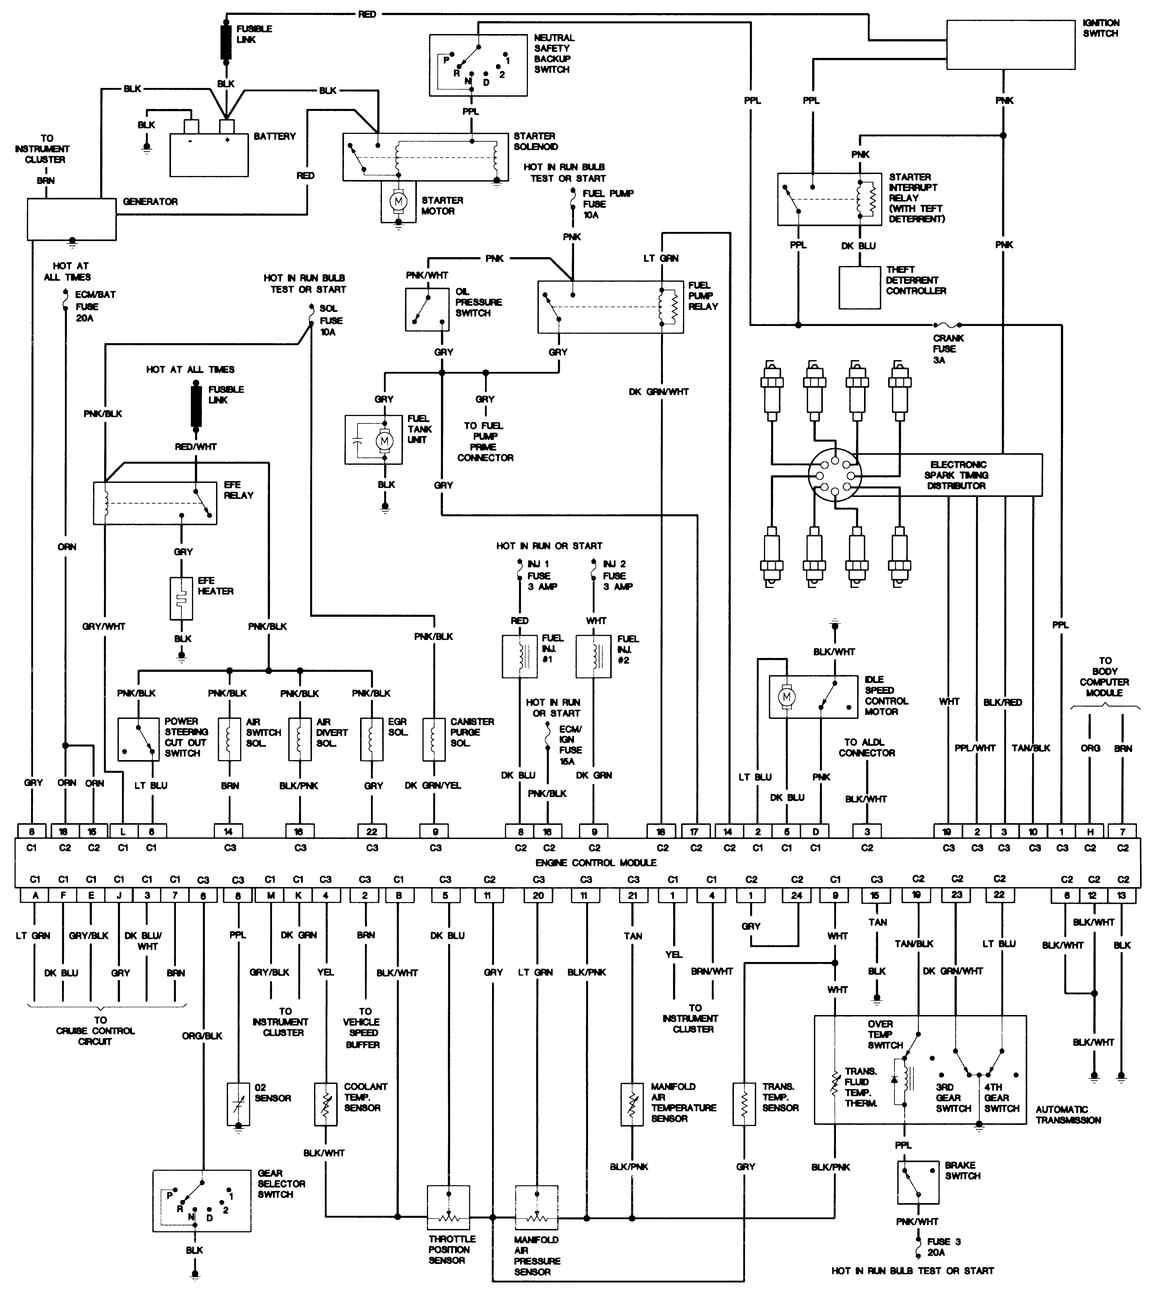 Fleetwood Flair Wiring Diagram Wiring Diagram Library